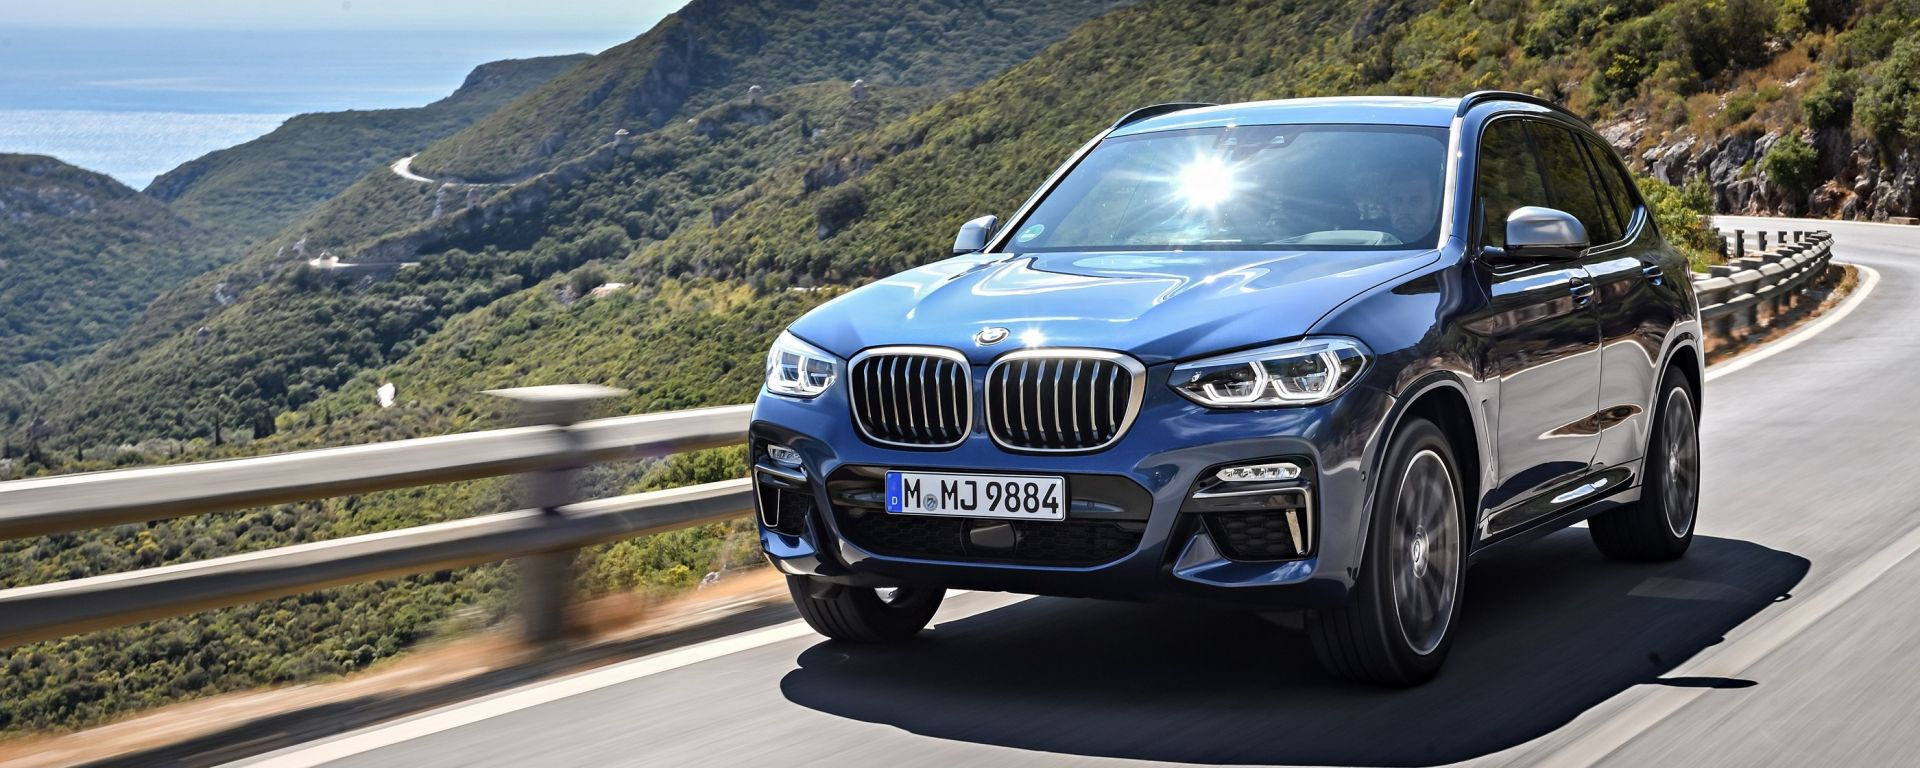 Nuova BMW X3 M40i, Phytonic Blue